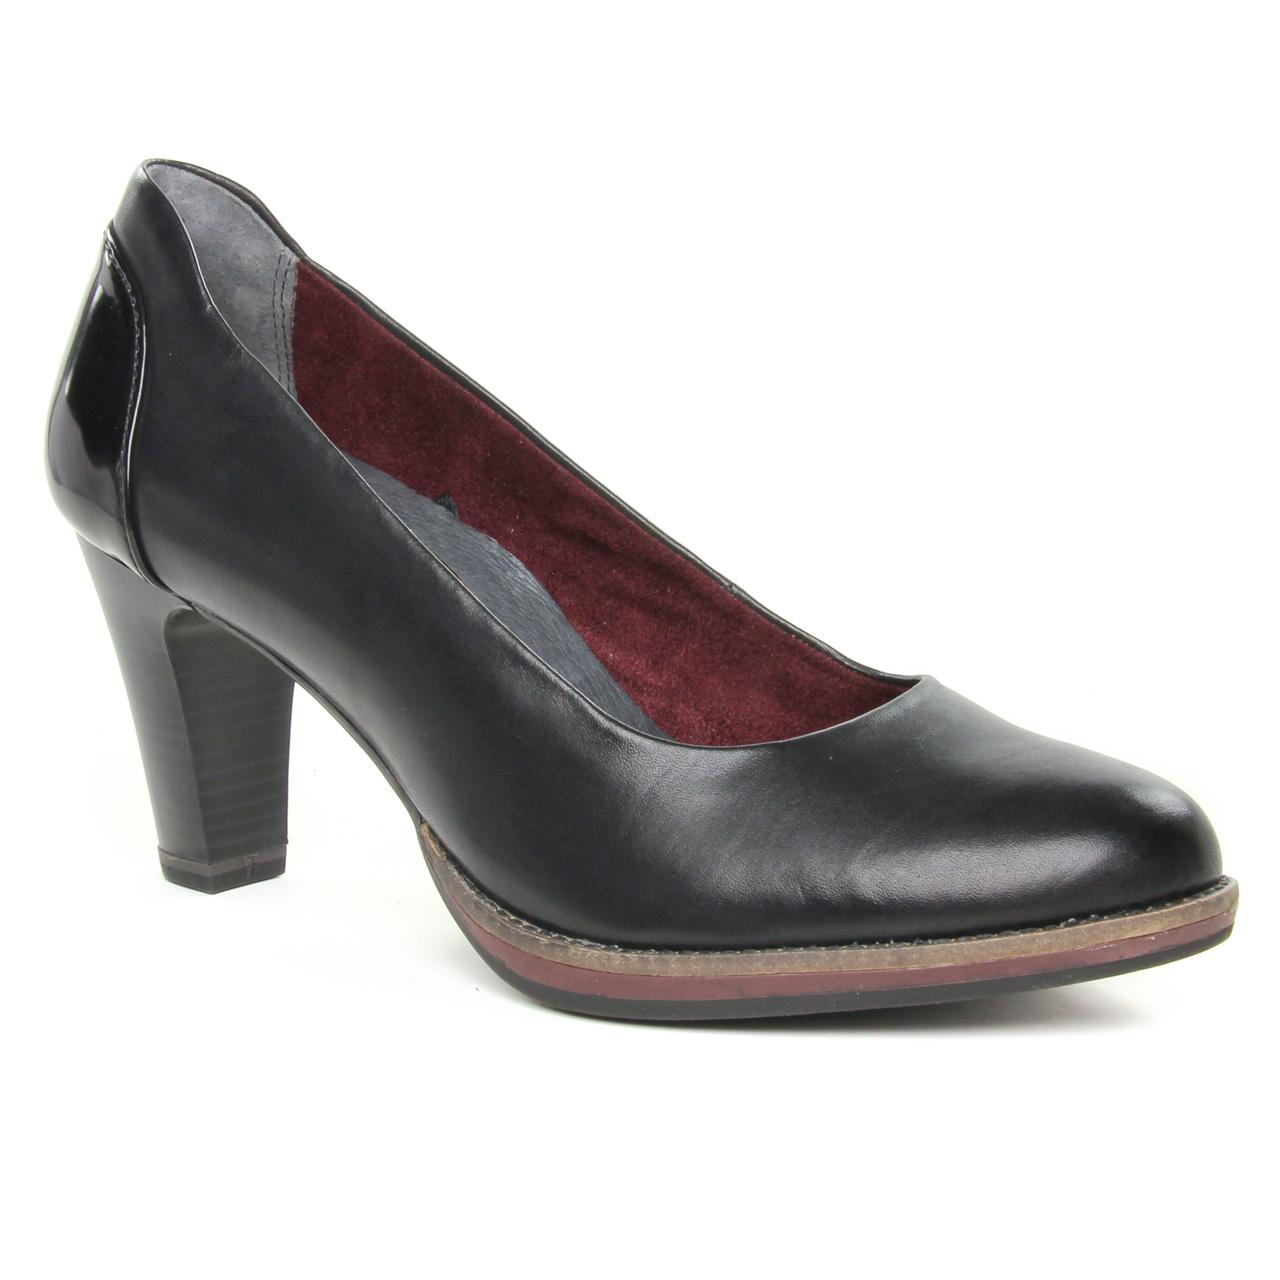 Fee femmes Chaussures escarpins en Noir Tamaris en coloris Black